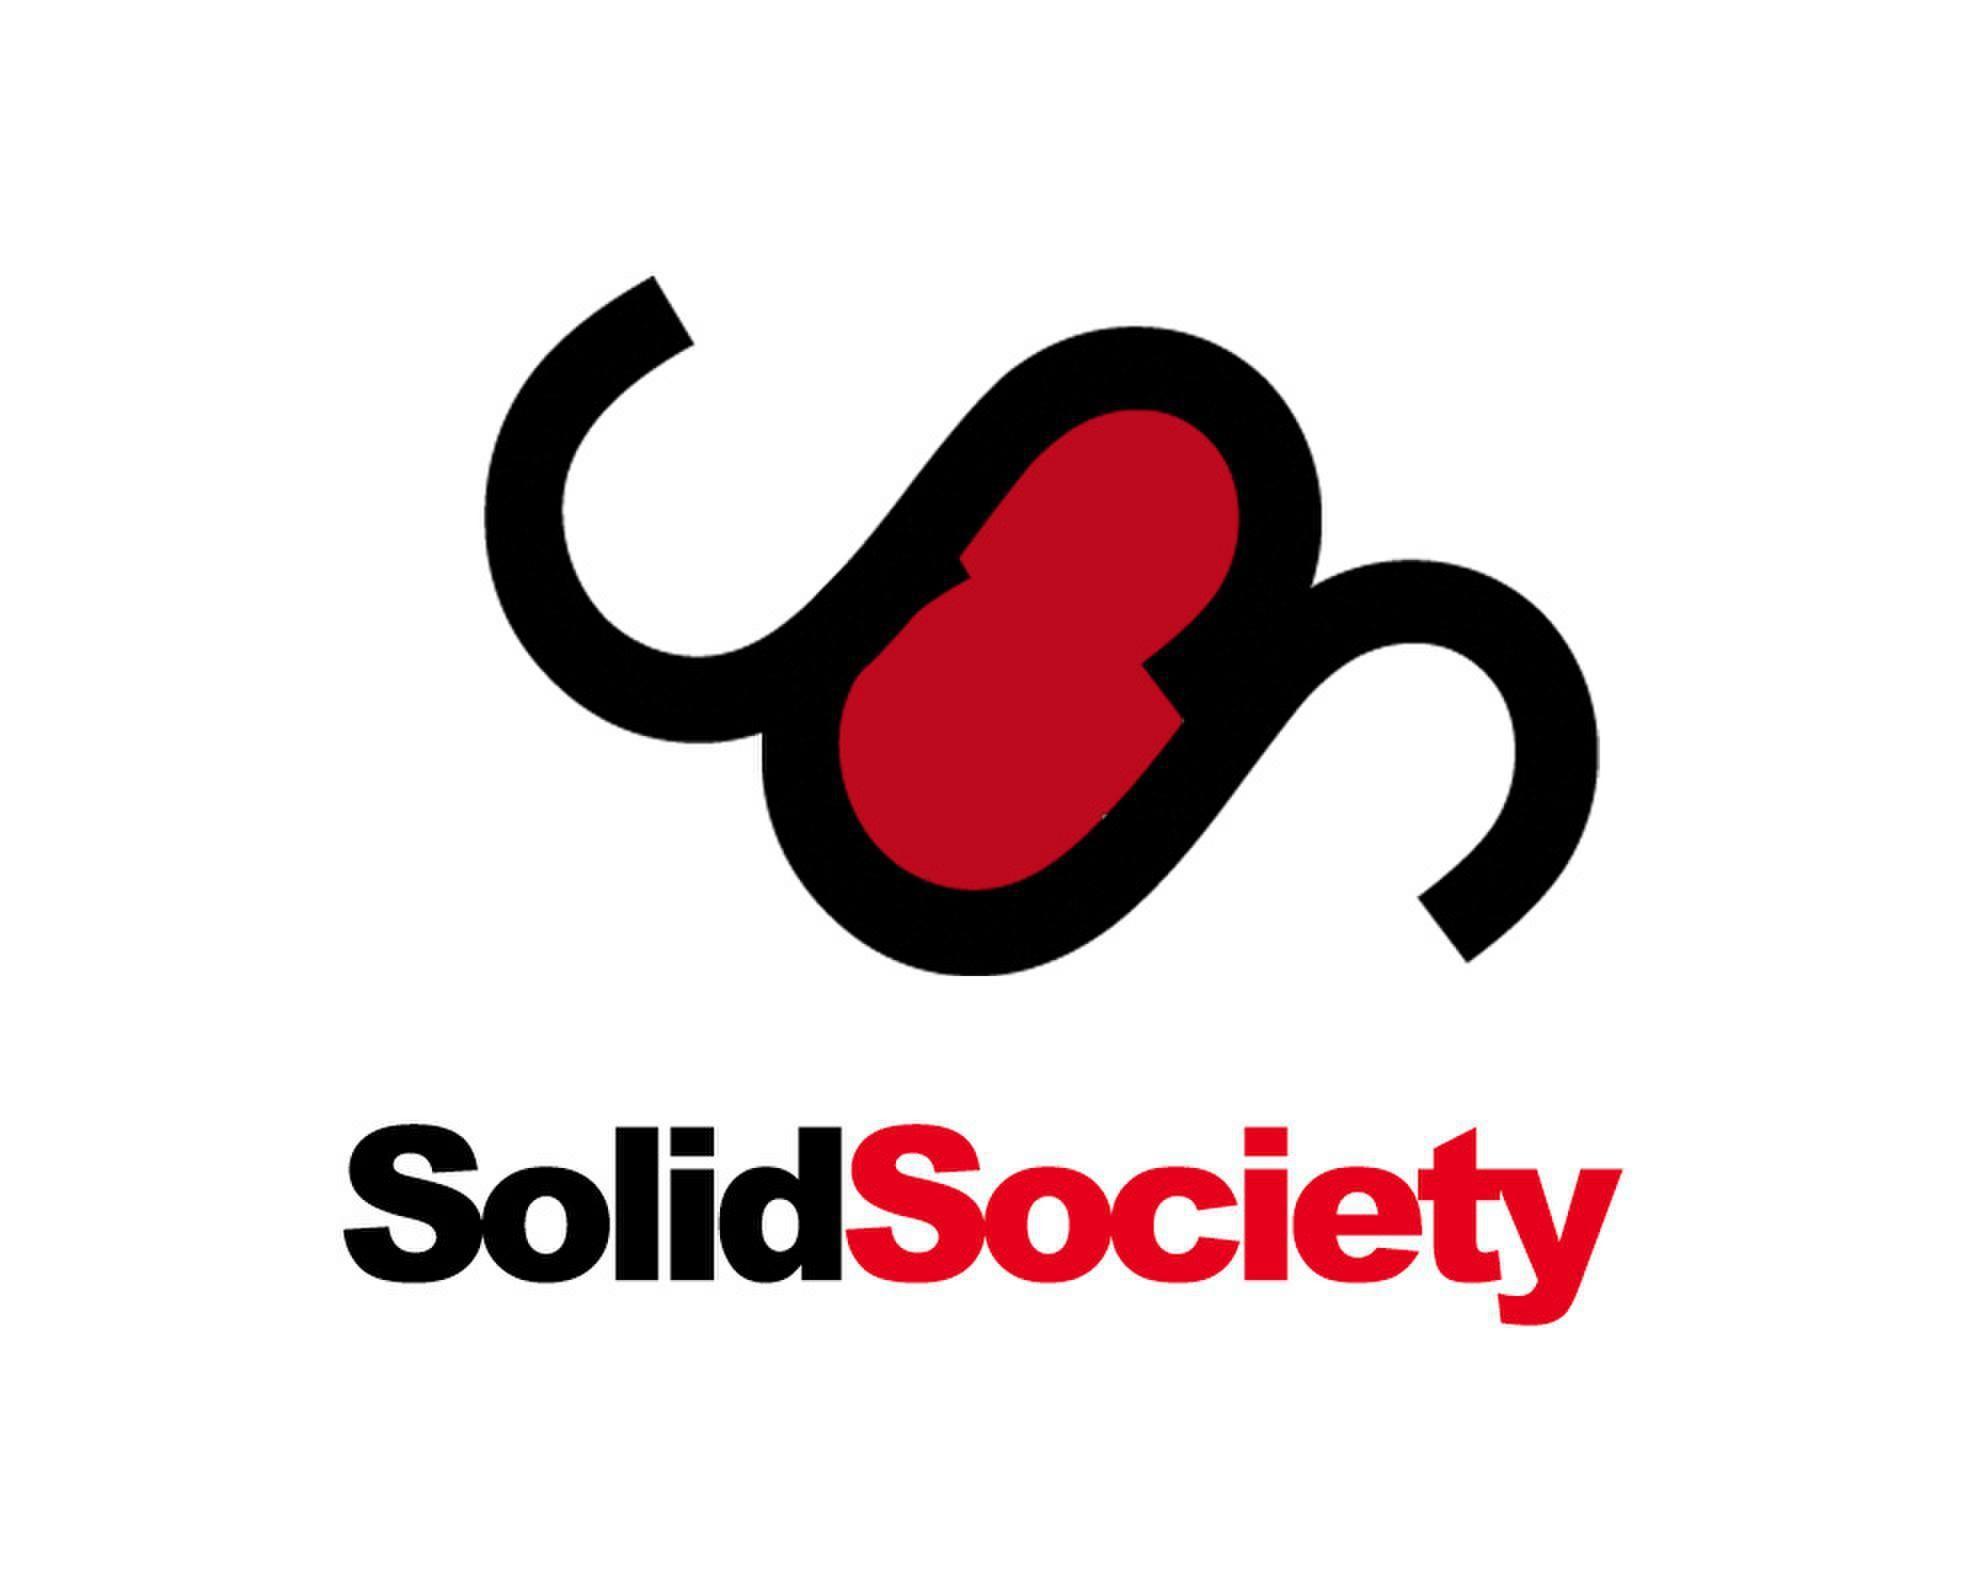 sample_logo_solidsociety.jpg